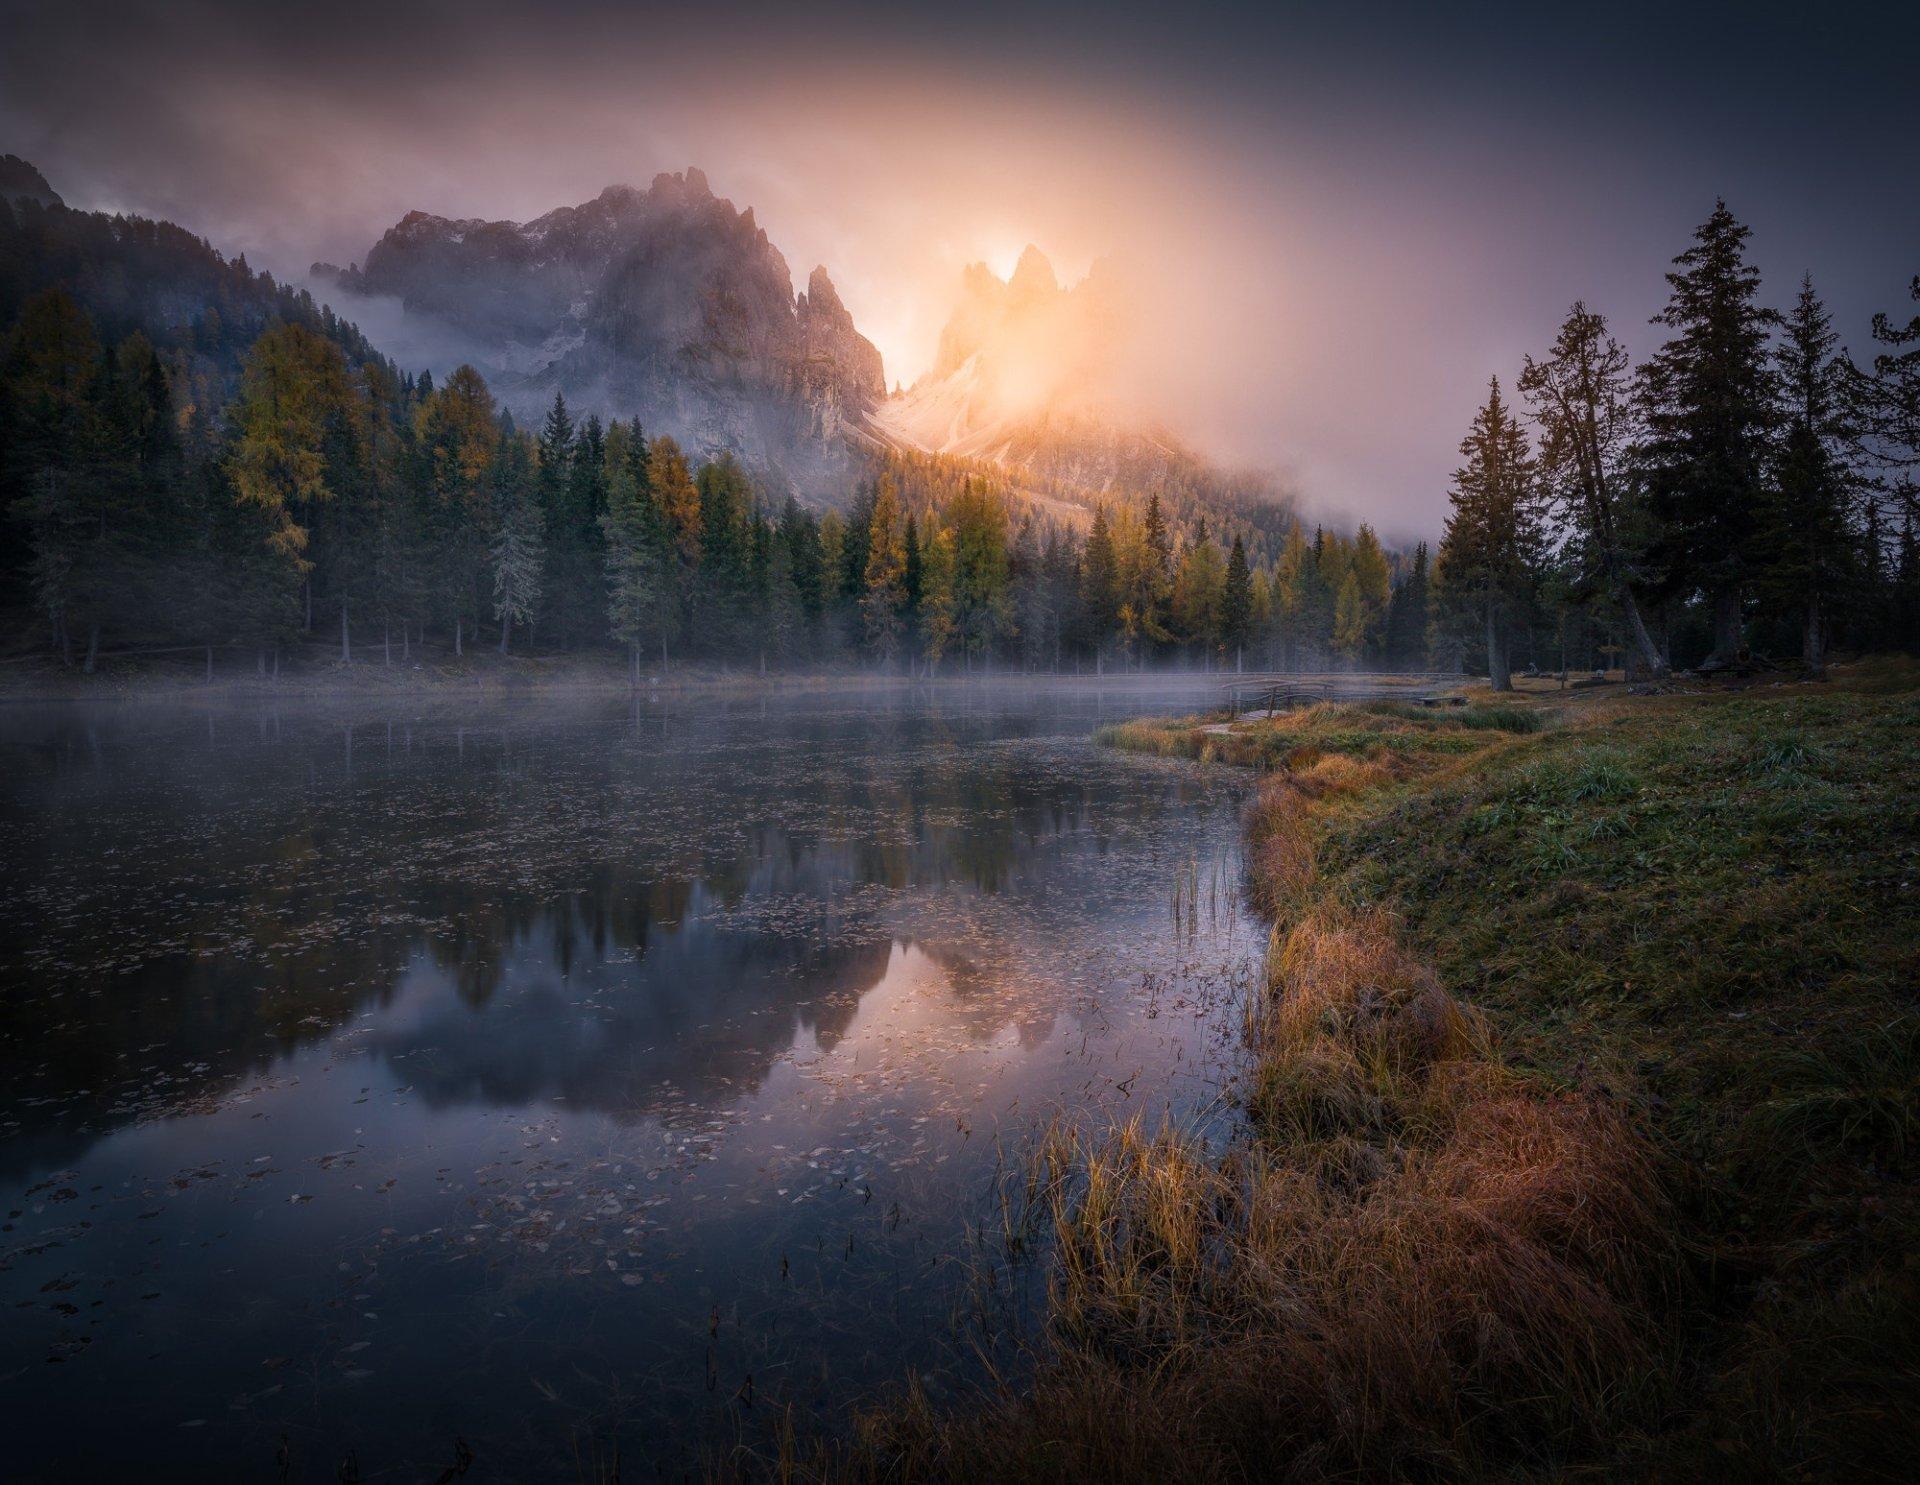 Earth - Fall  Forest Rock Cliff River Fog Lake Wallpaper